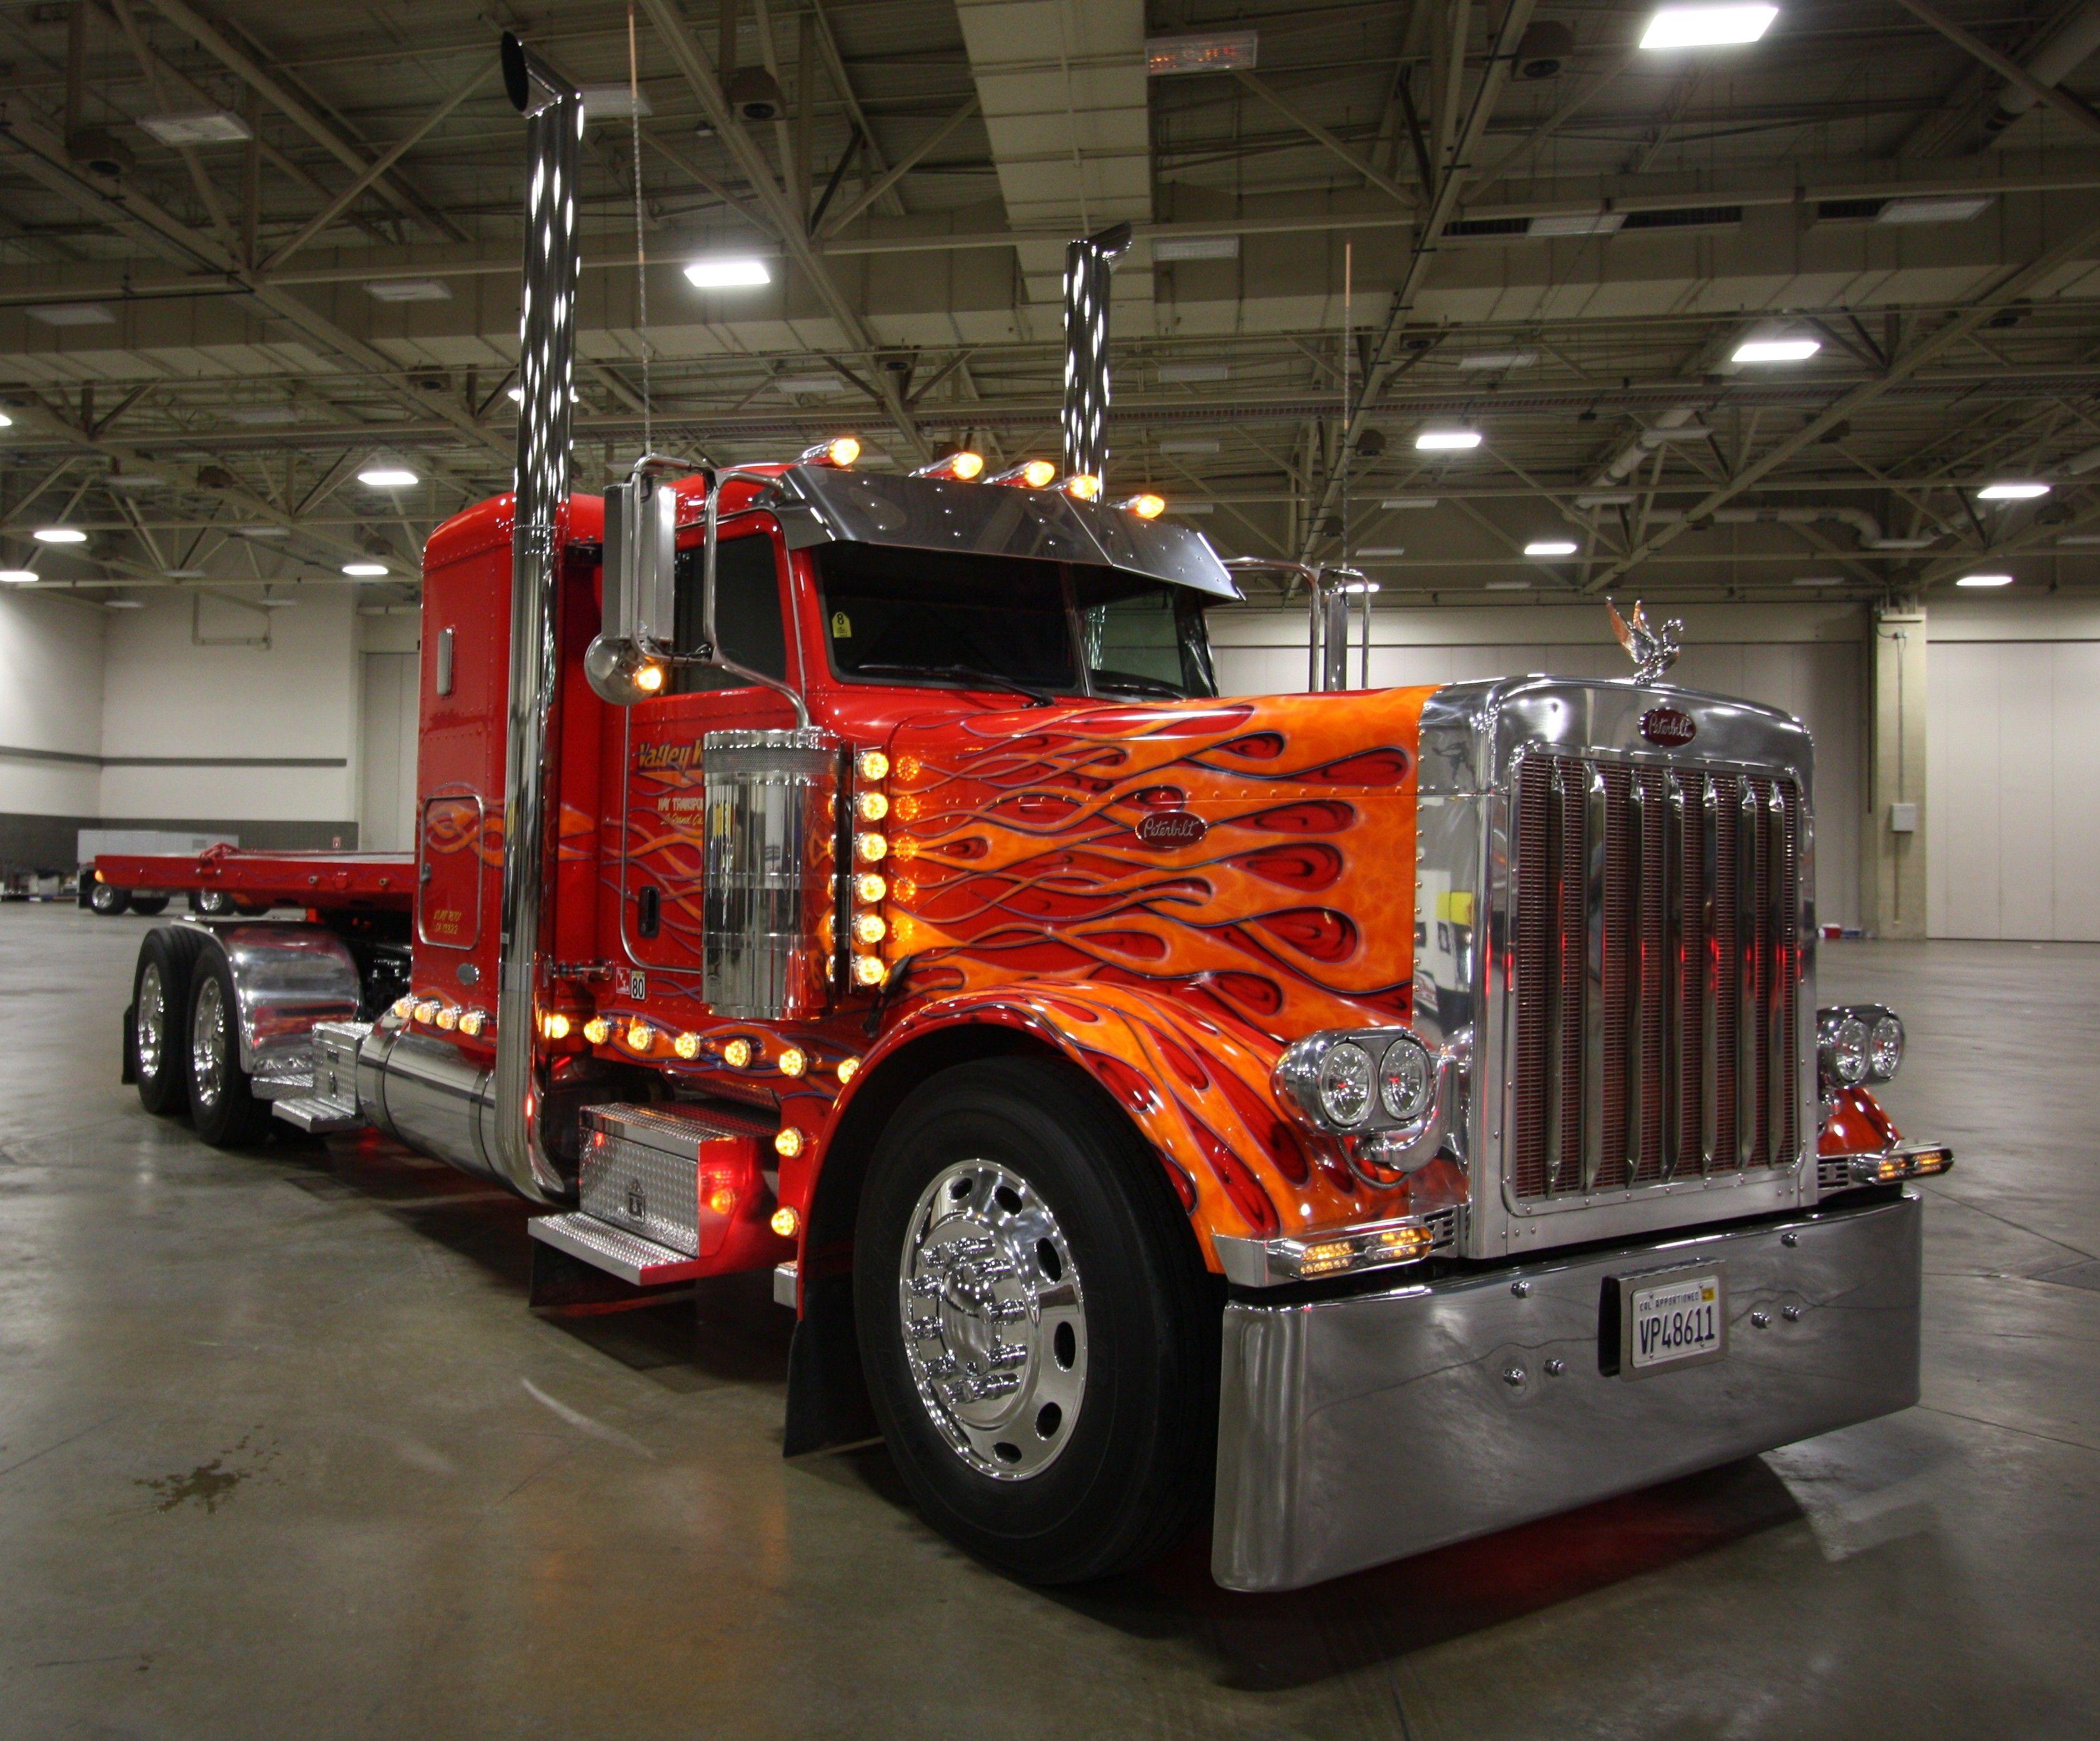 Red Flames Custom Paint Big Rig